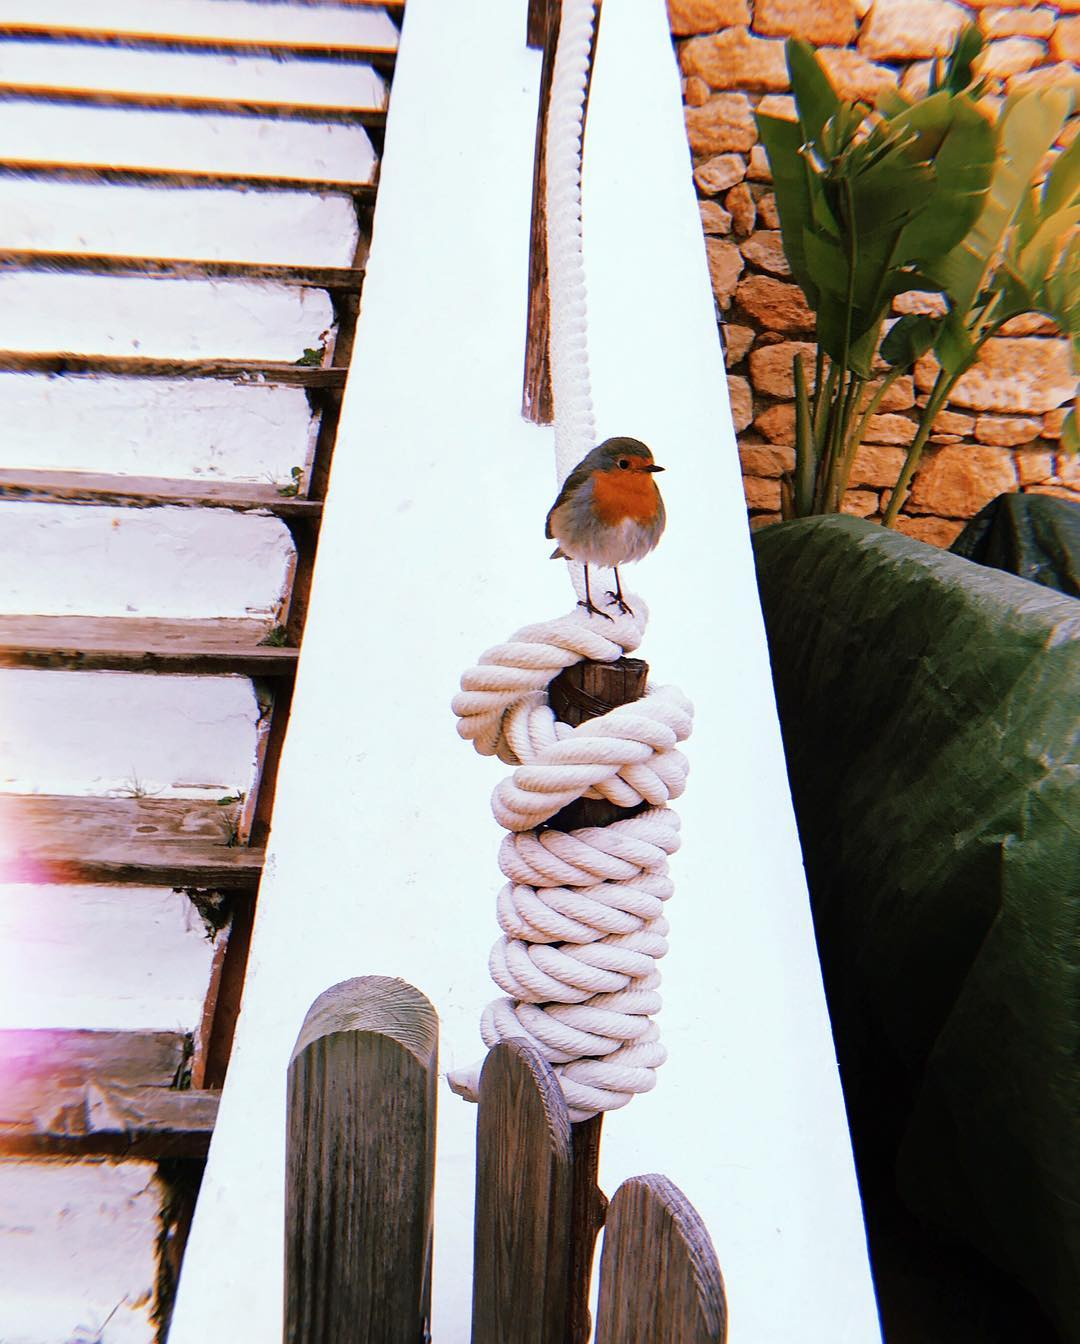 // Cute Visitor // #lascicadasibiza #robin #bird #freespirit #nature #campo #animals #mediterranean #january #calm #winter #season #guests #country #home #ibiza #finca #boutiquevilla 🕊🧡